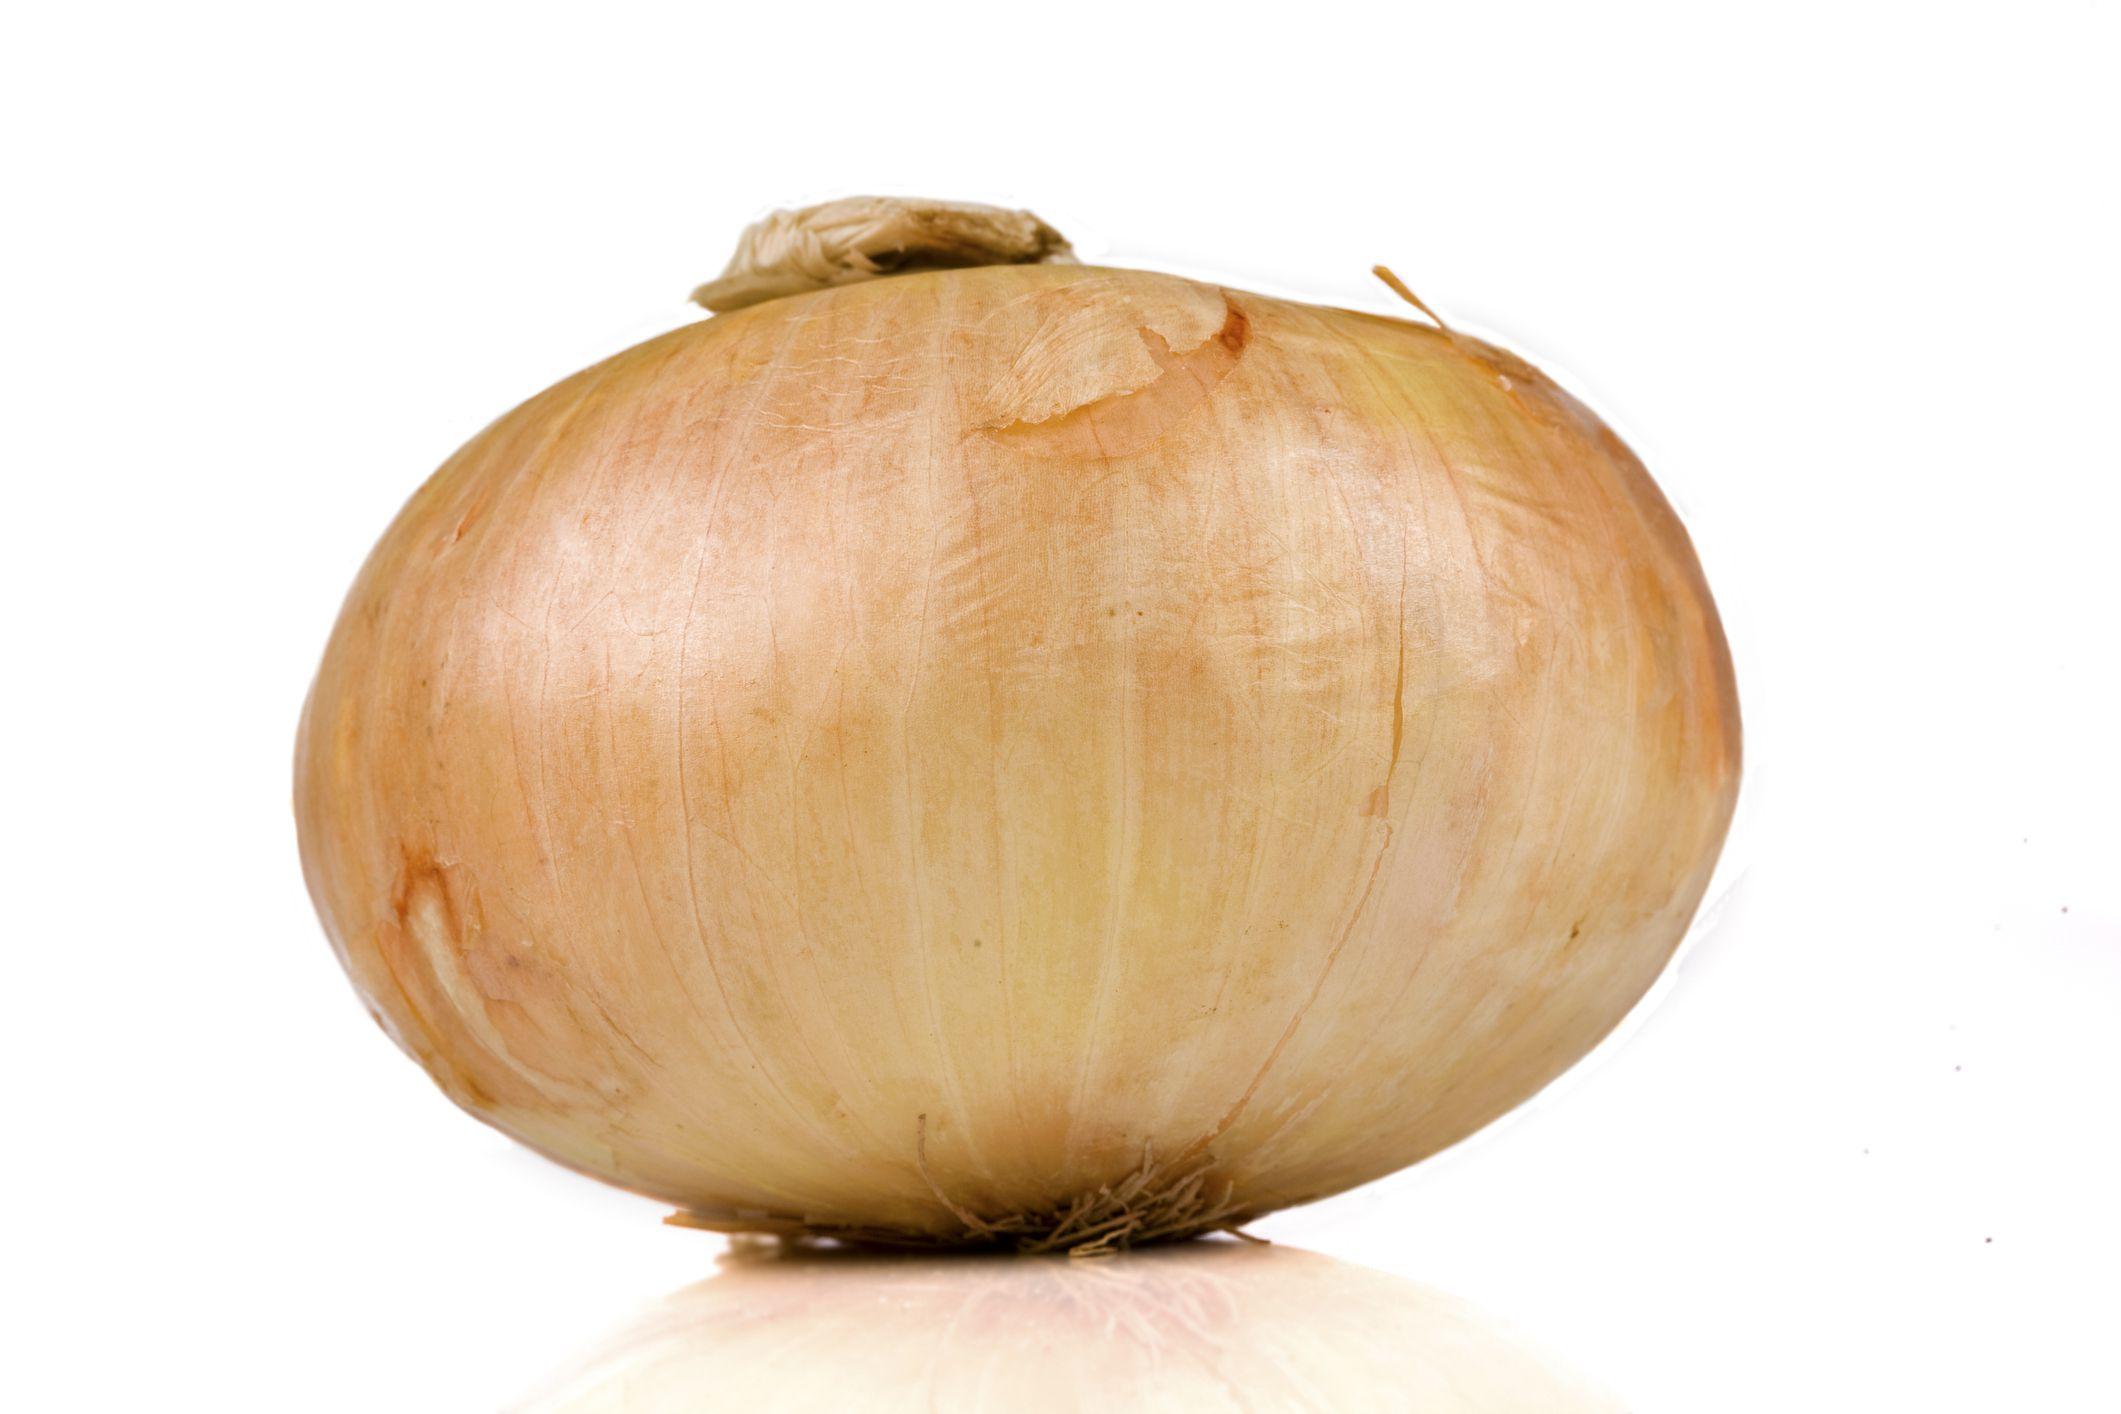 How to Cook Sweet Vidalia Onions